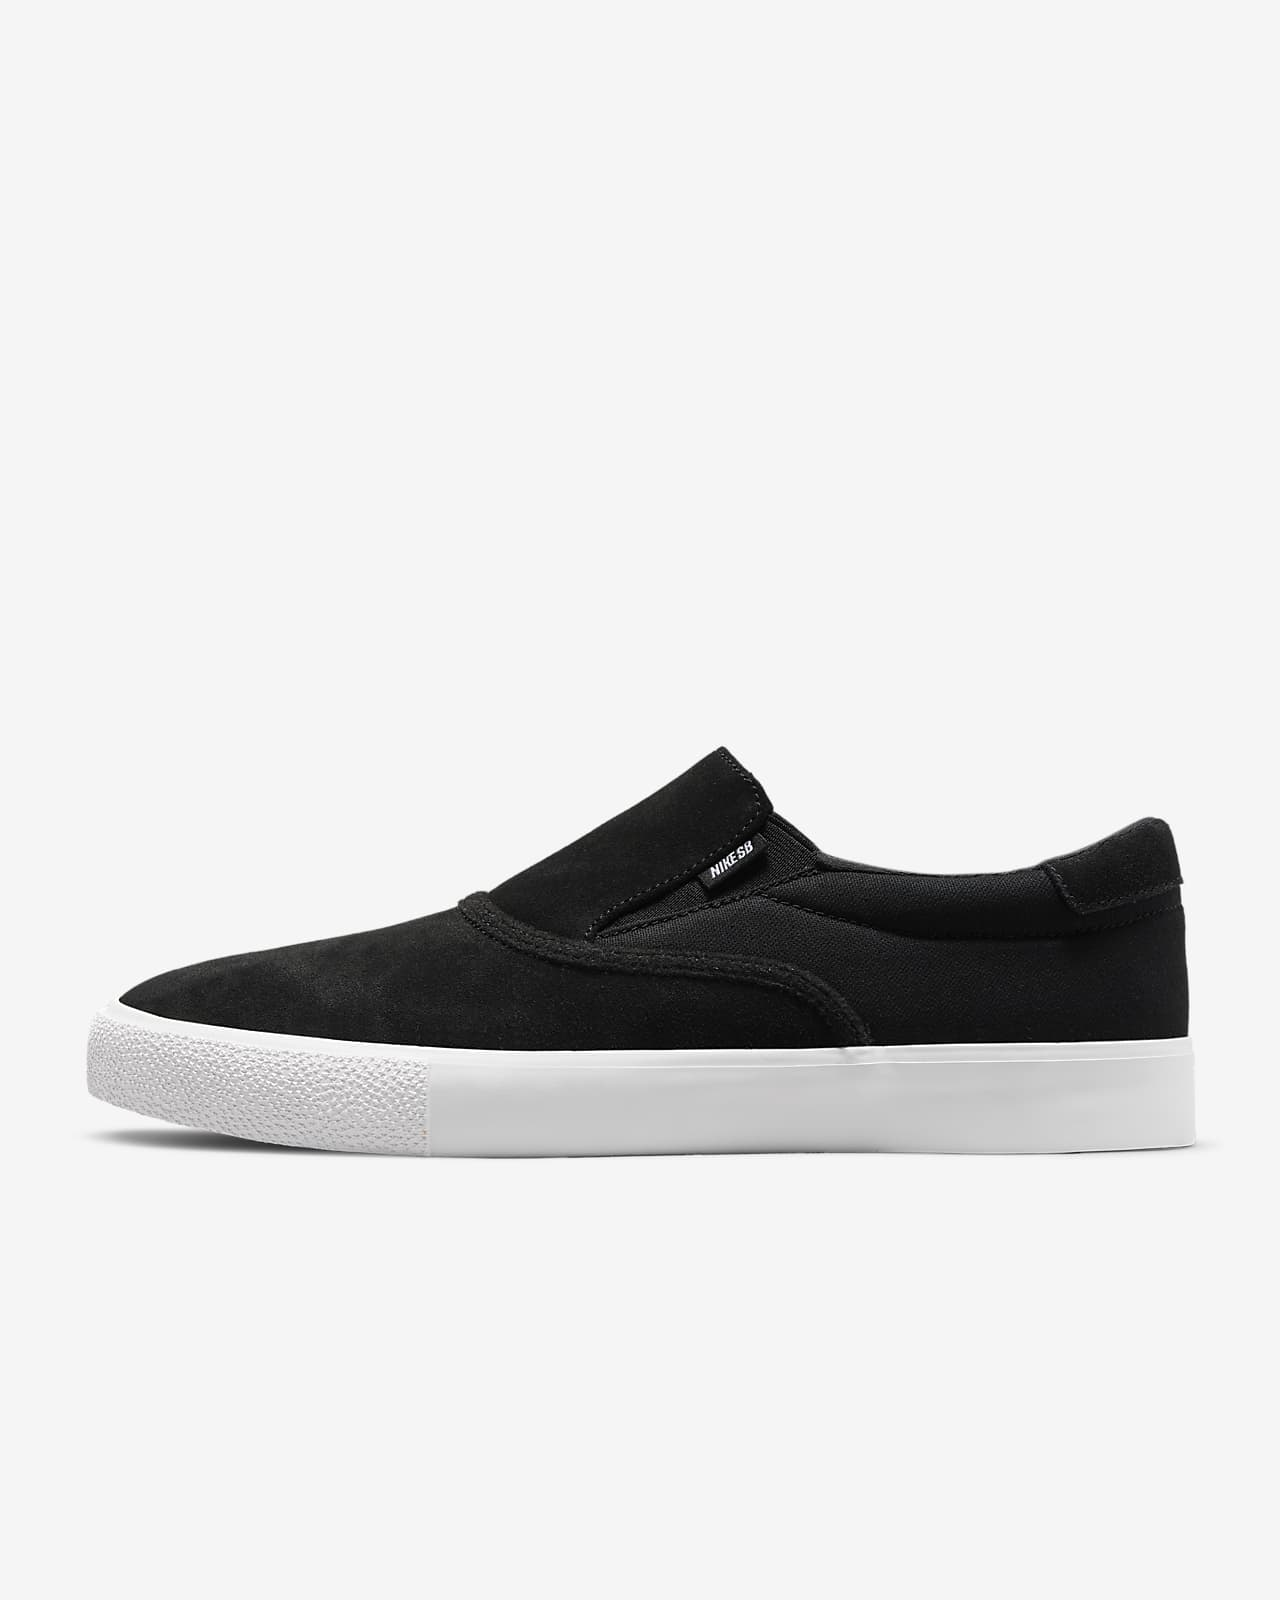 Chaussure de skateboard Nike SB Zoom Verona Slip